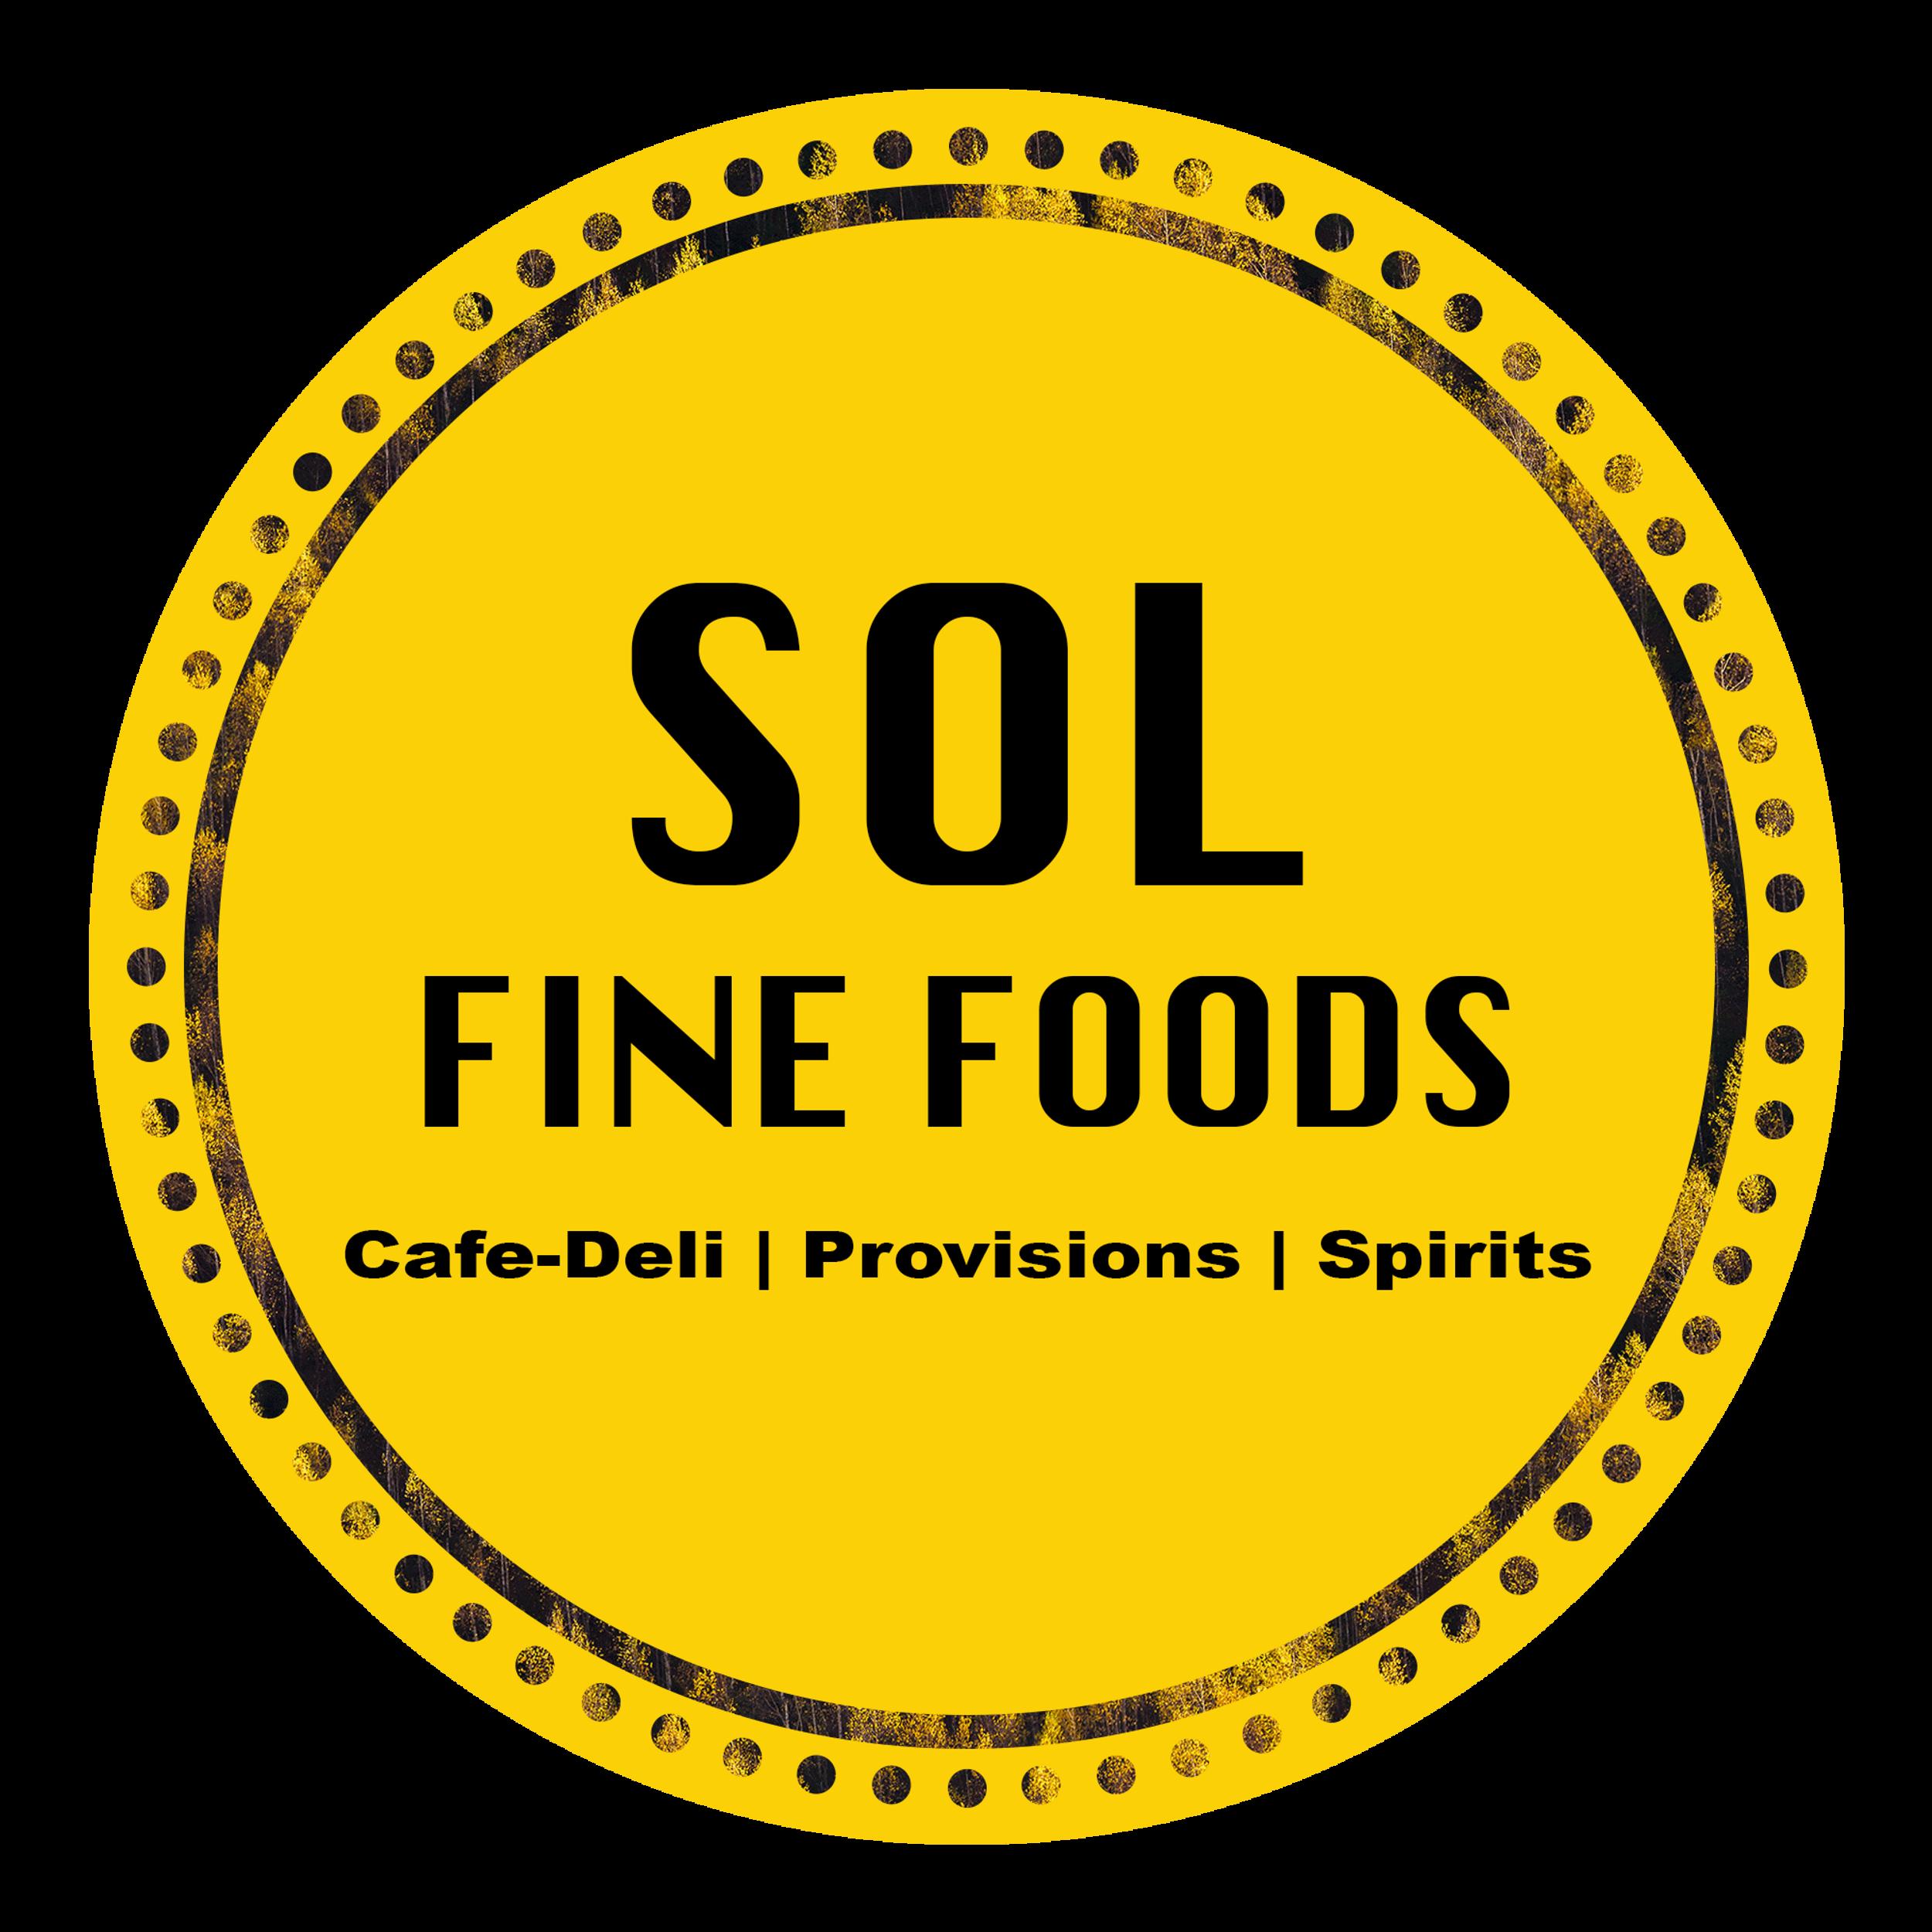 Sol Food Cafe Deli Catering logo